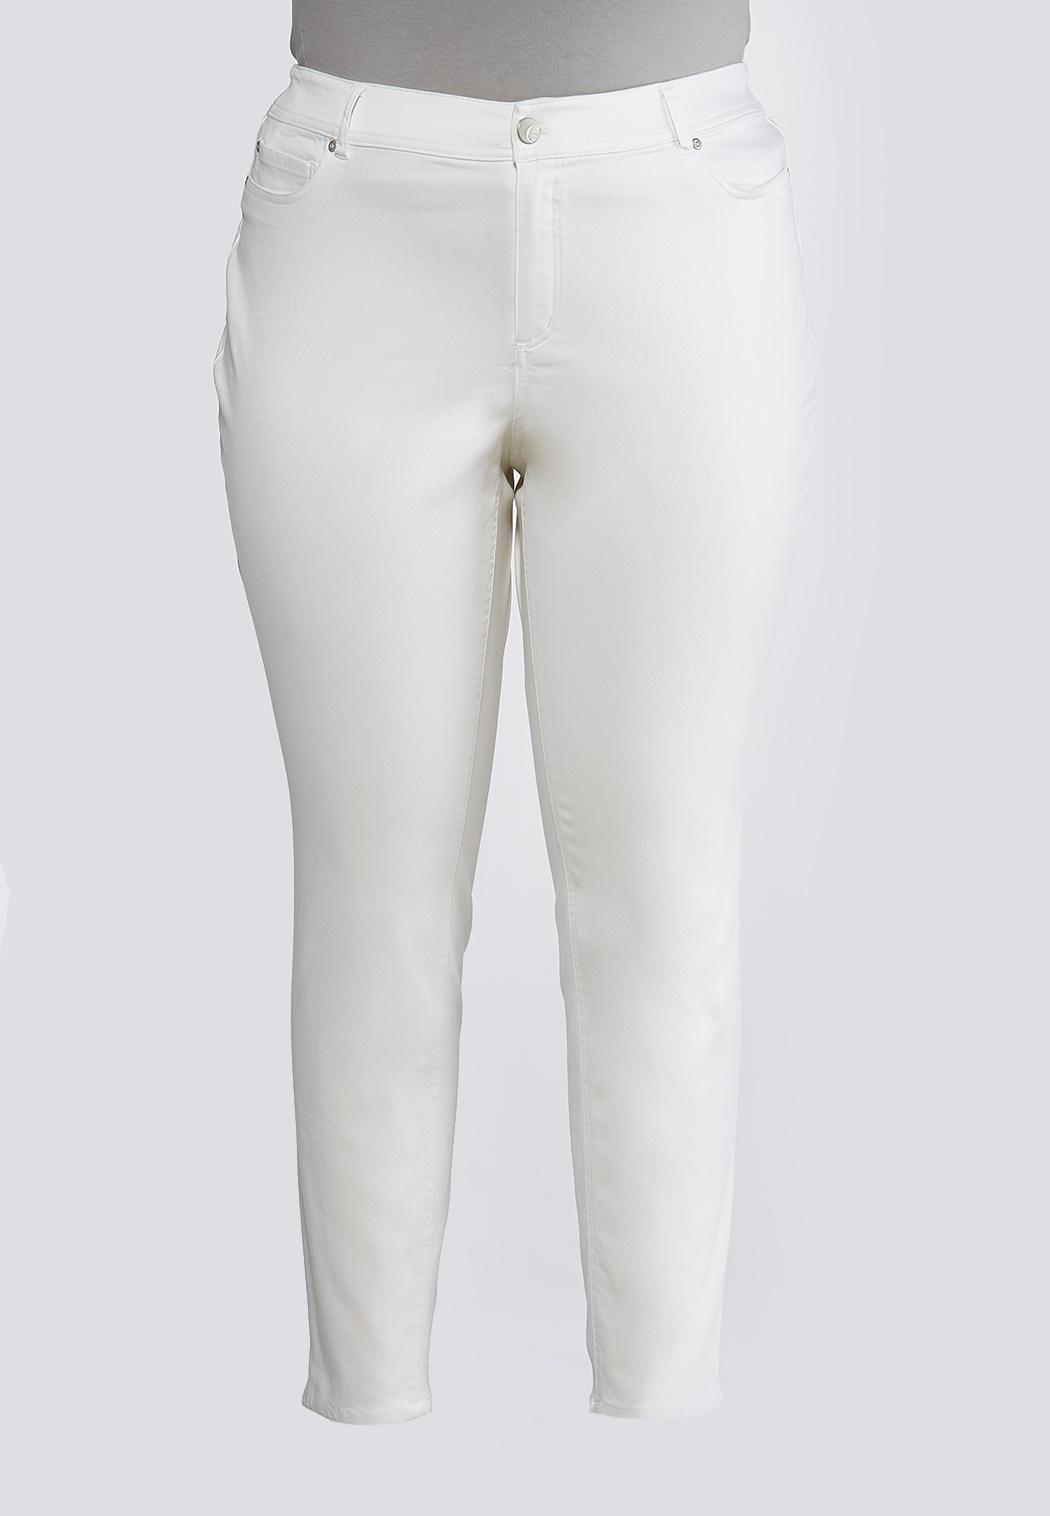 Plus Size Uplifting White Jeggings